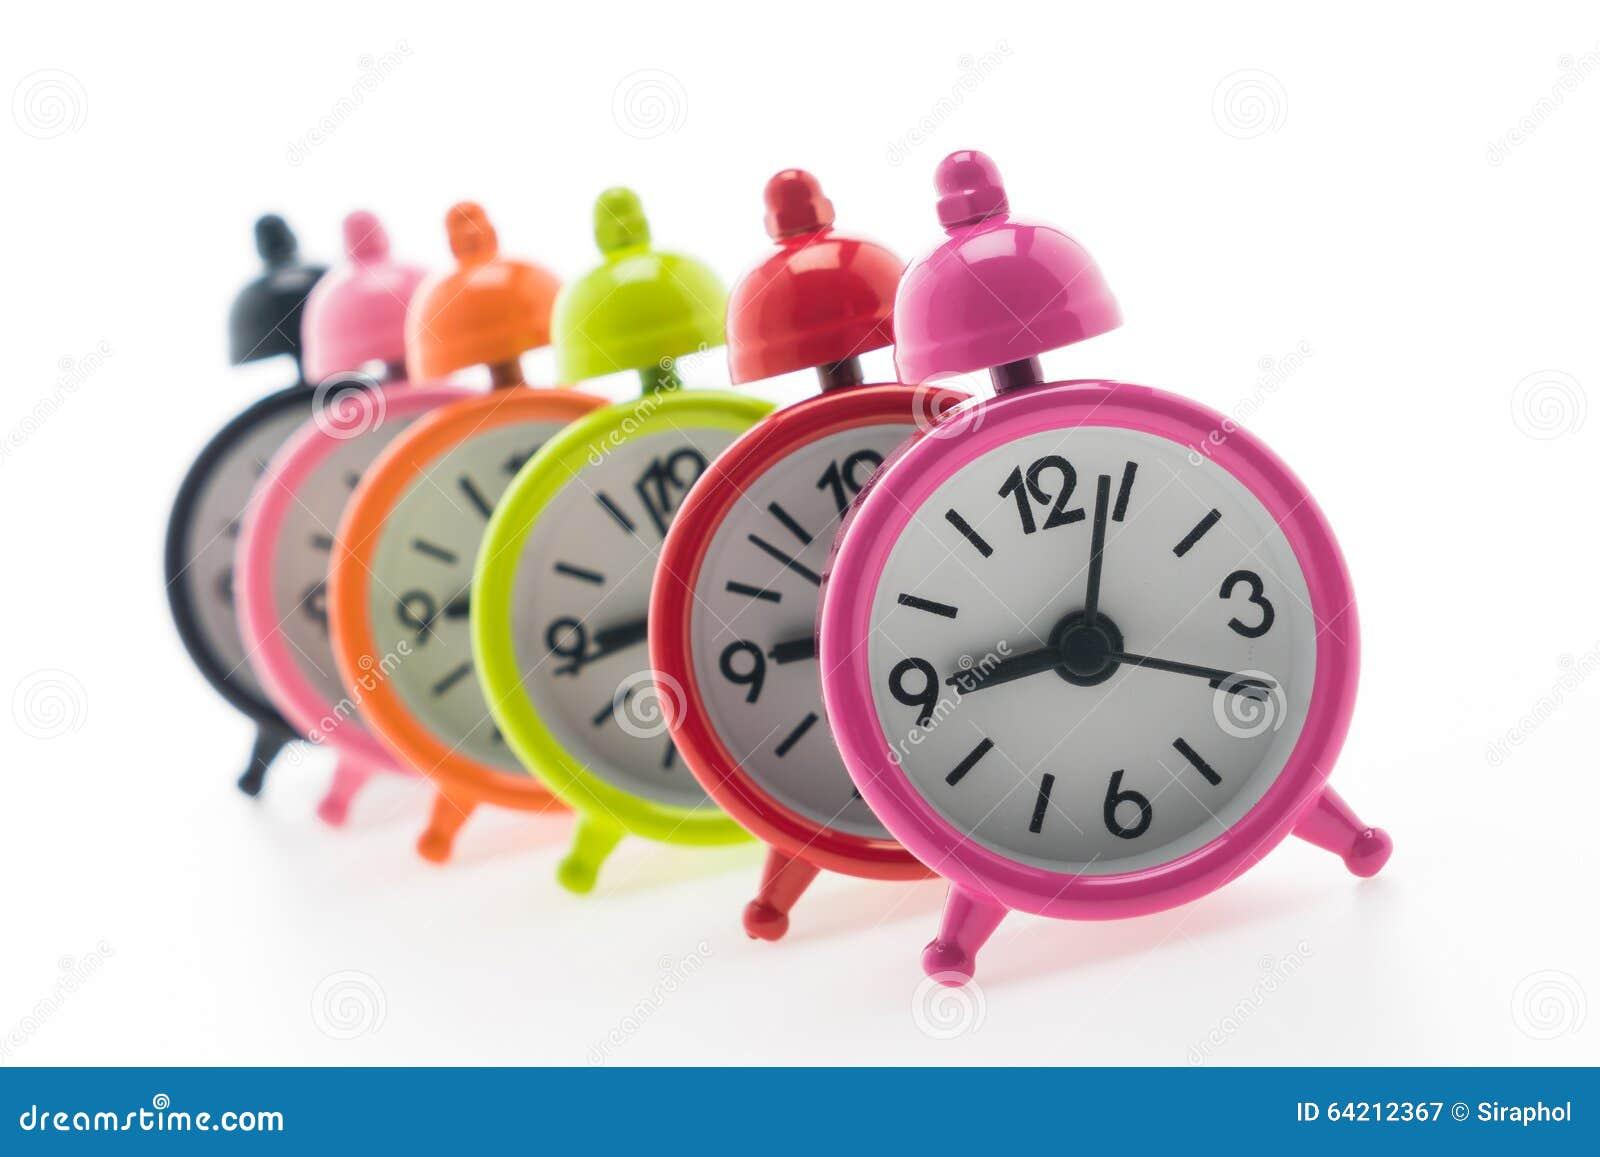 Reloj de alarma clásico